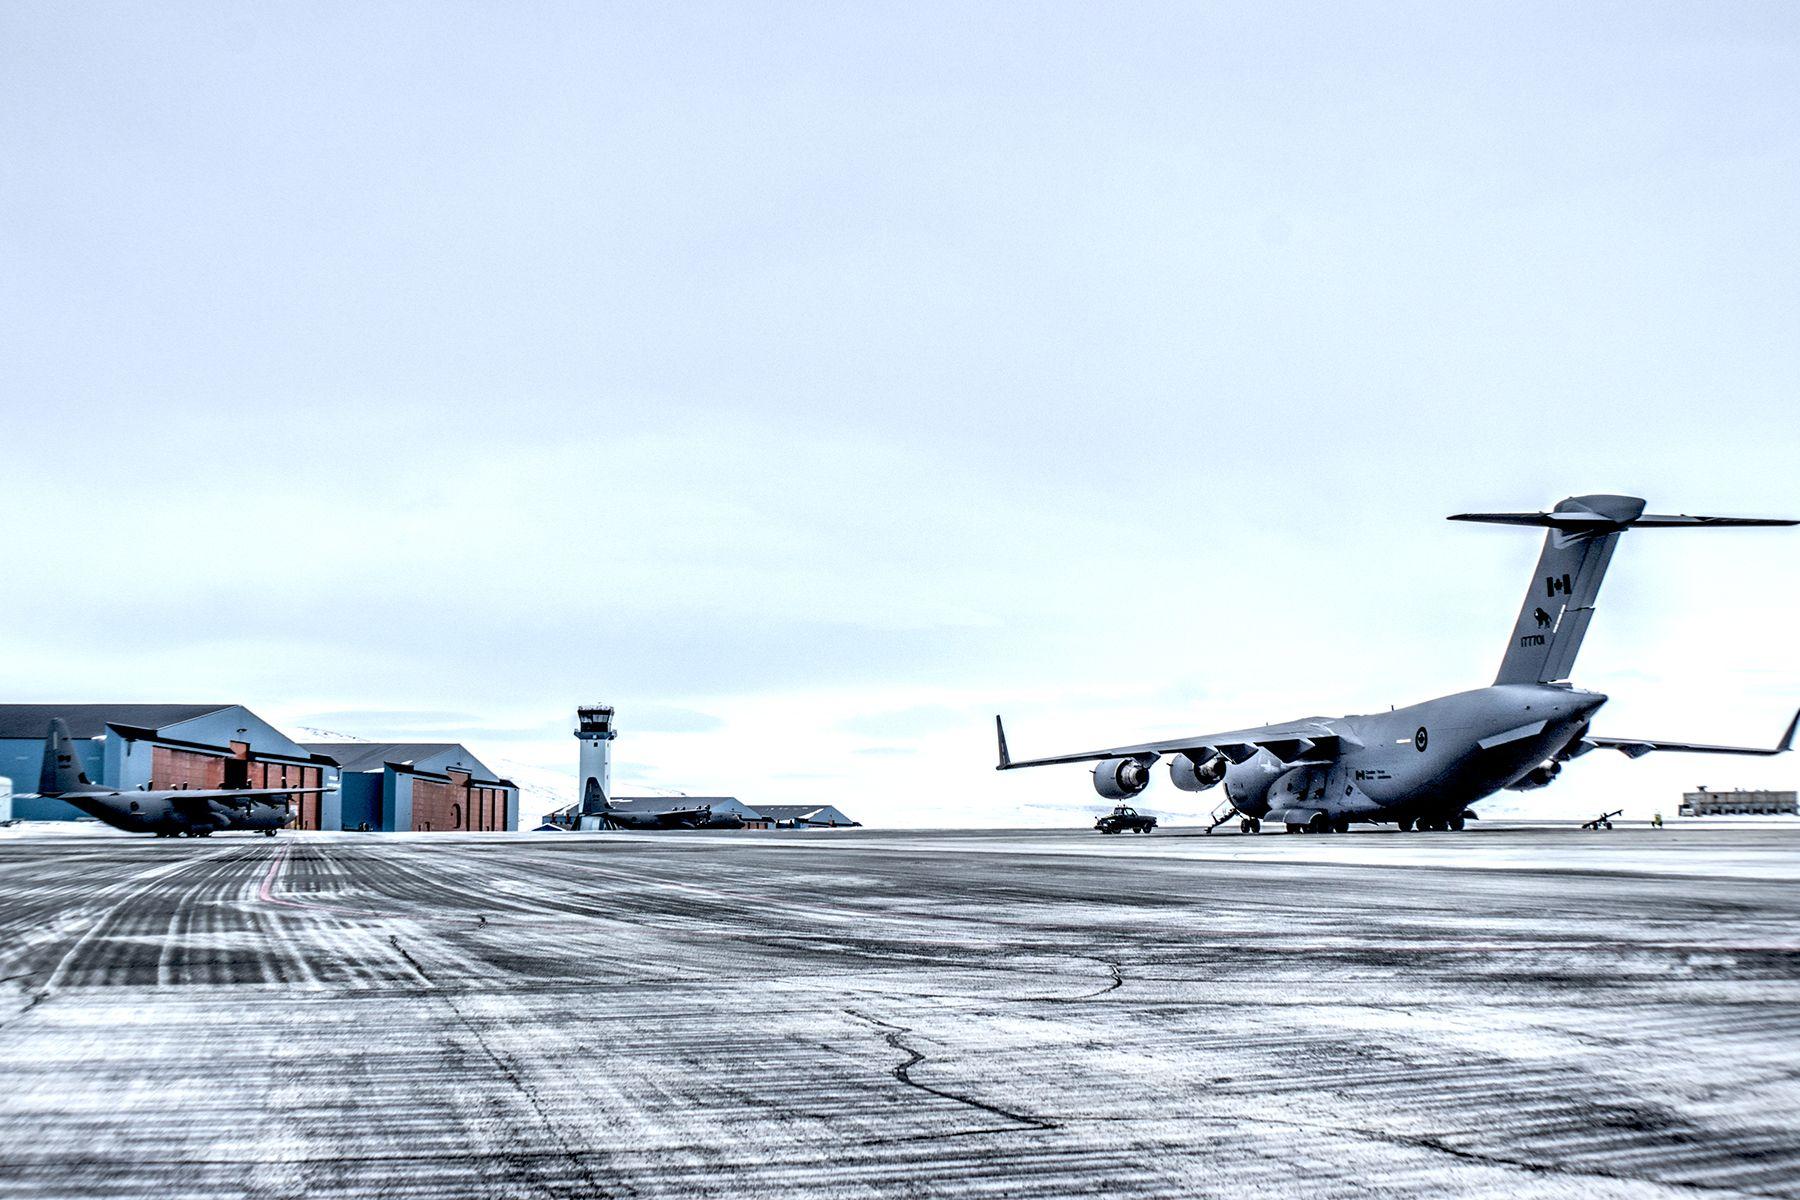 THULE AIR BASE, Greenland – A Royal Canadian Air Force C-17